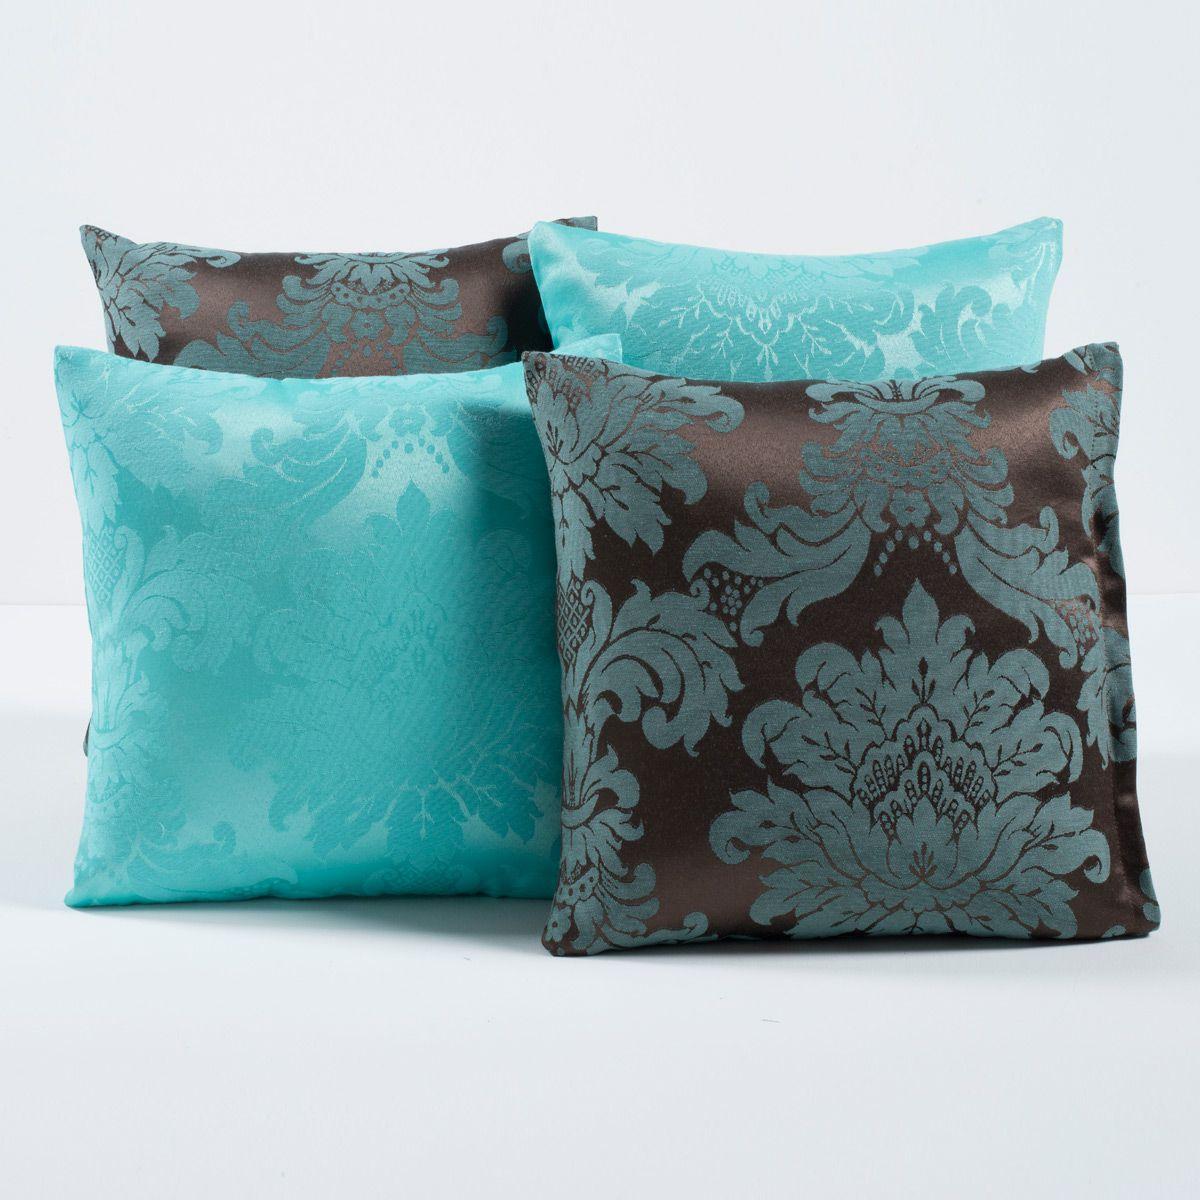 Kit c/ 4 Almofadas Cheias Decorativas Tiffany/Tabaco 04 Peças c/ Refil